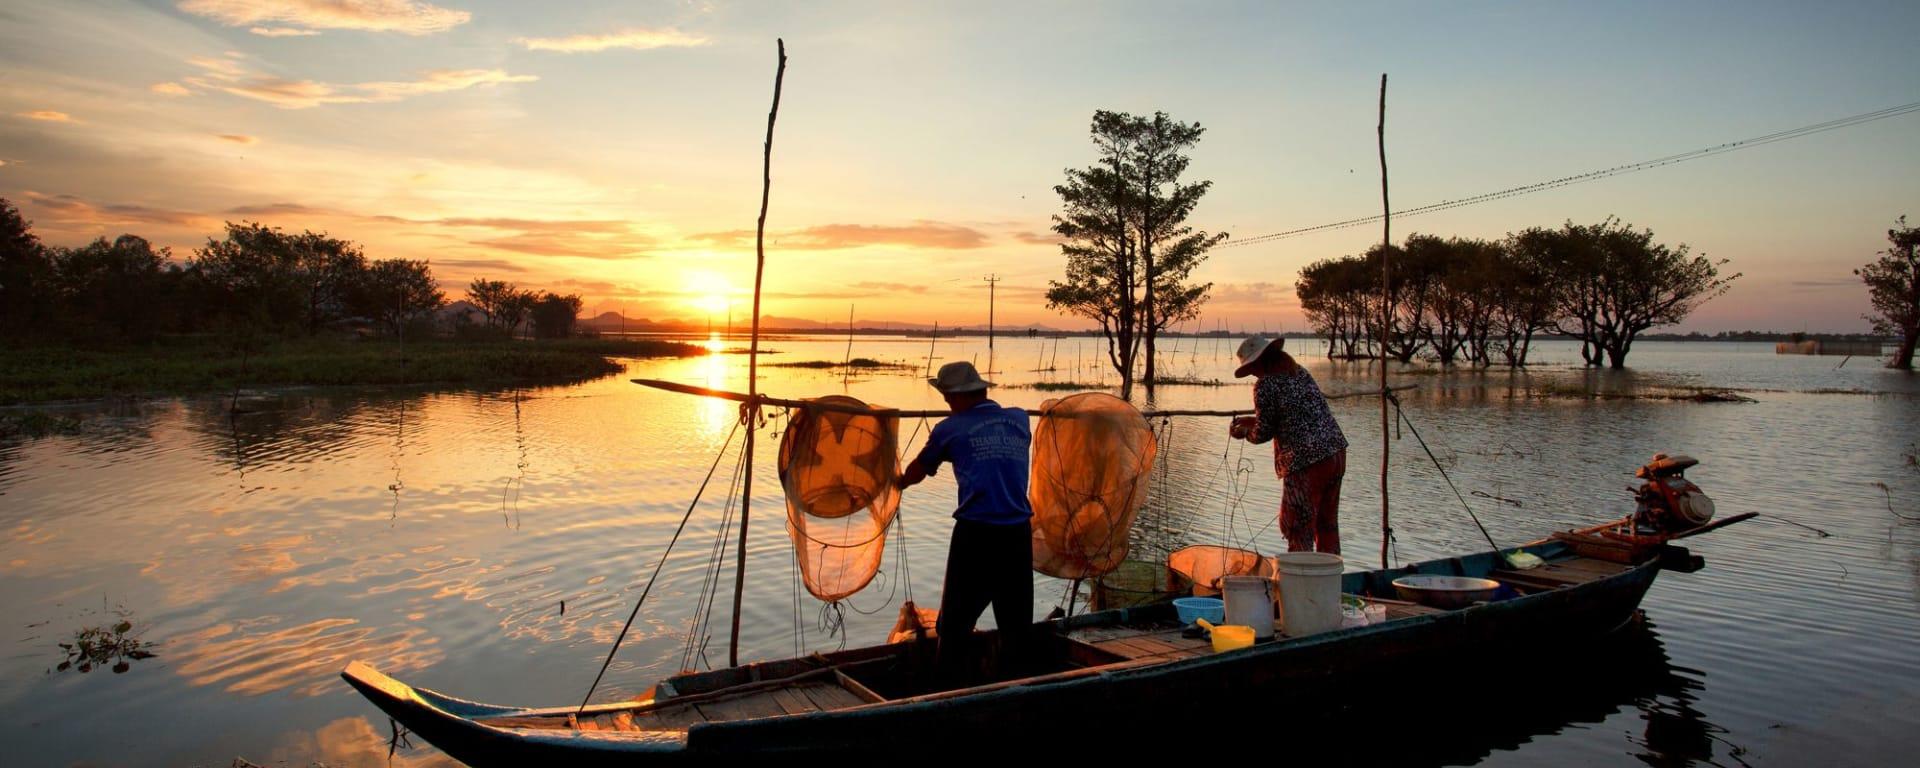 Faszinierendes Mekong Delta - ab/bis Saigon: Mekong Delta, Chau Doc